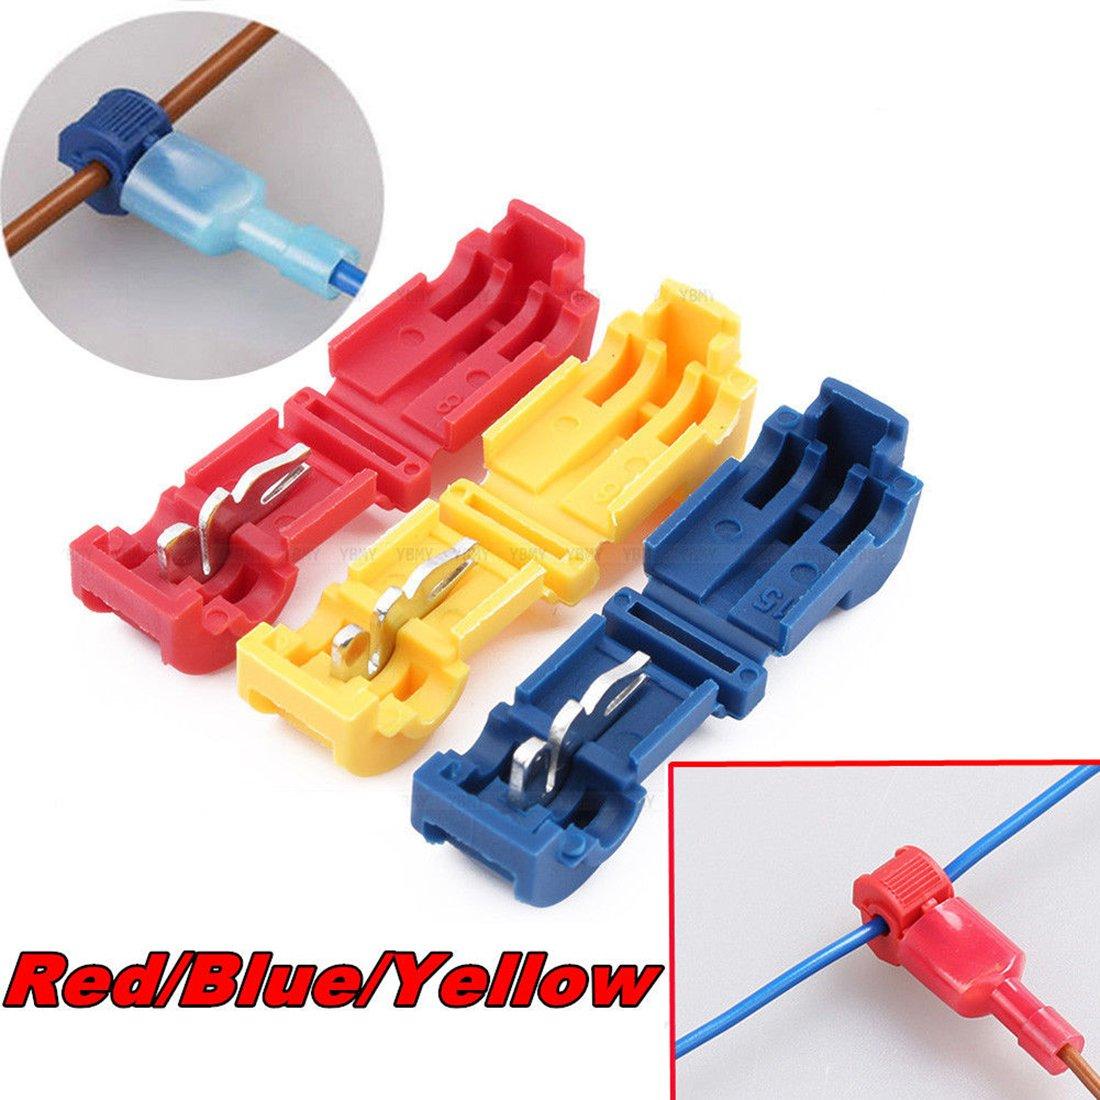 60pcs Wire Connectors, Yellow/Blue/Red Gauge Quick Splice Lock Wire Terminals Connectors Spade Wire Crimp Electrical Wire Set